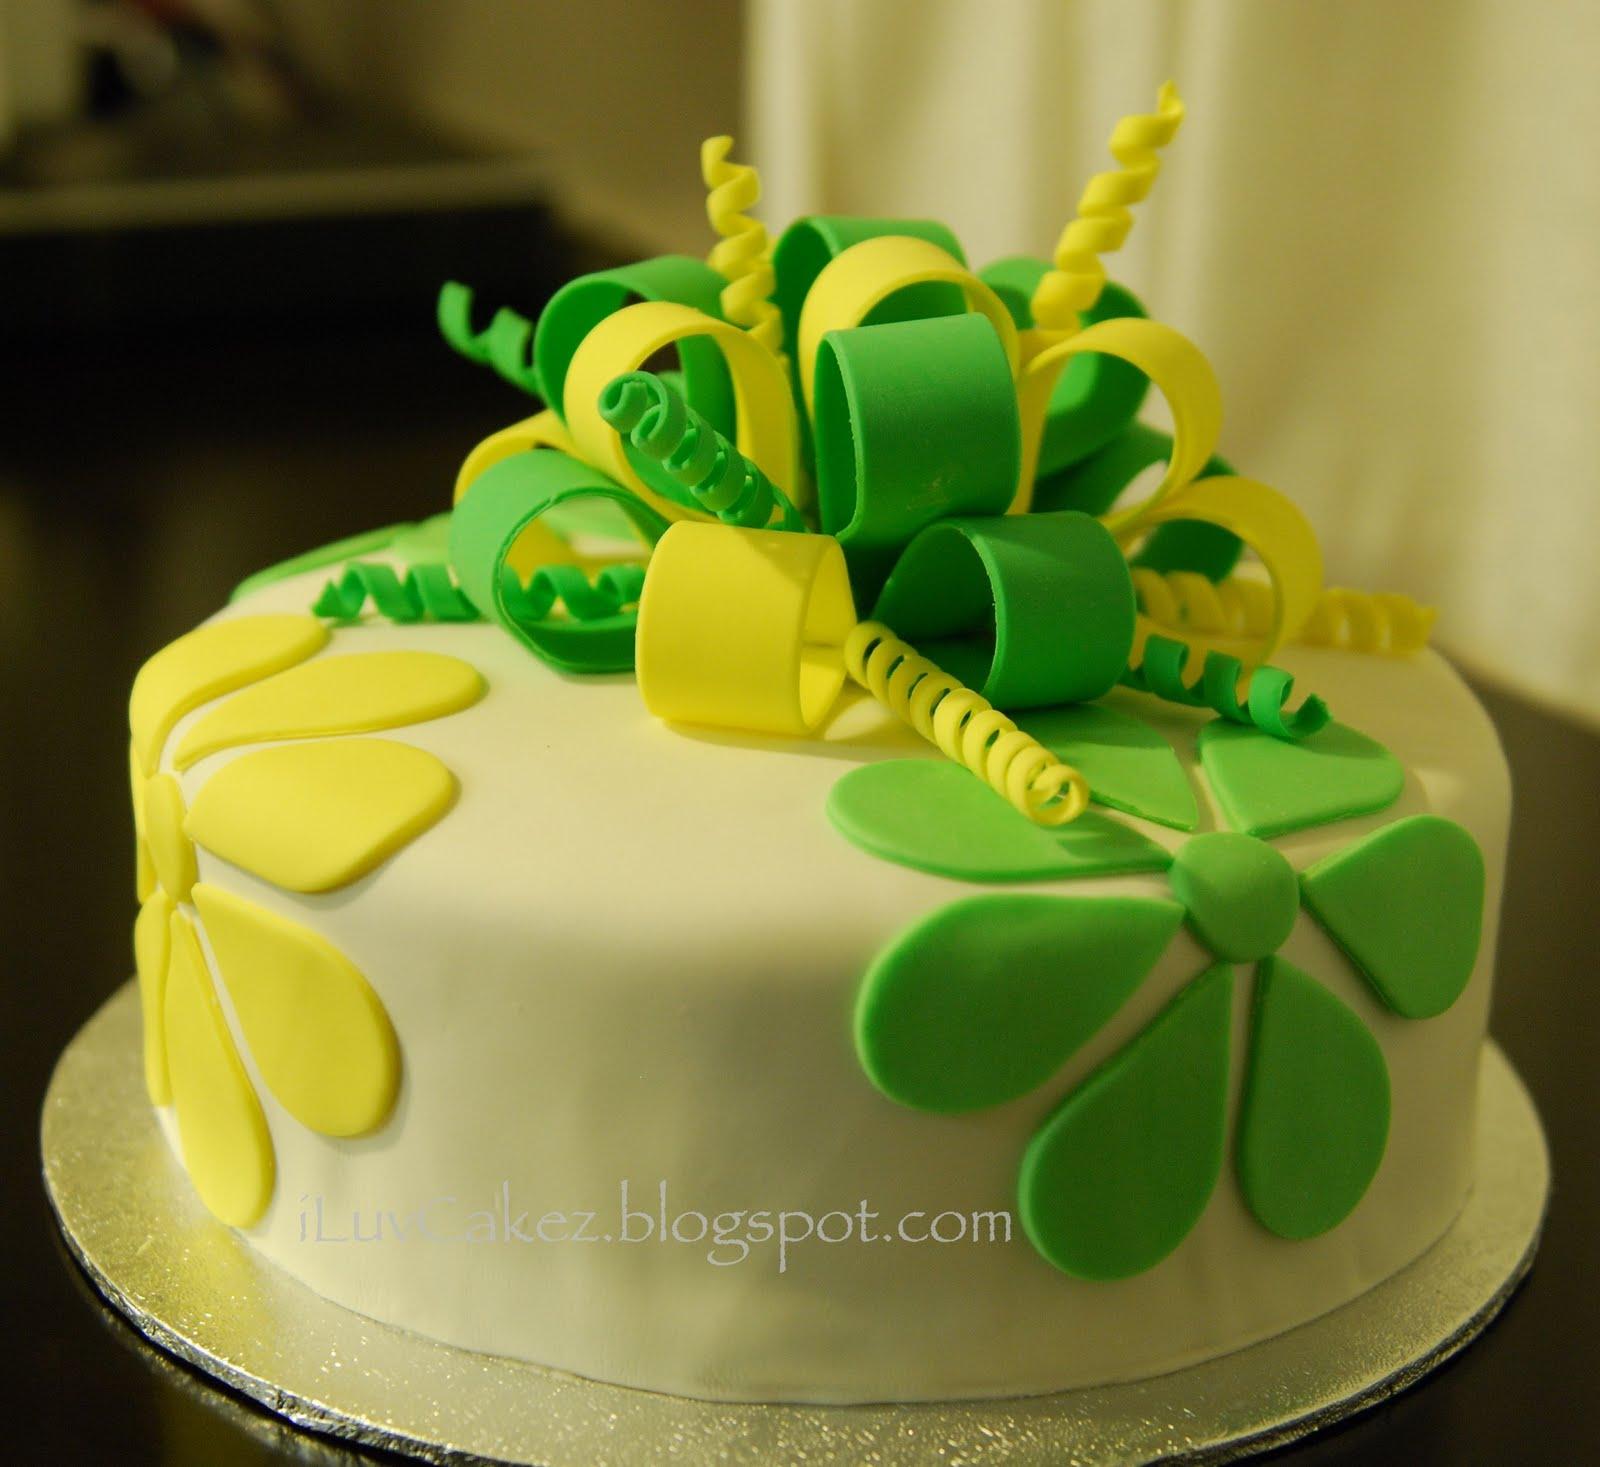 iLuv Cakez: Misato's 12th Birthday Cake (Green & Yellow Bow)